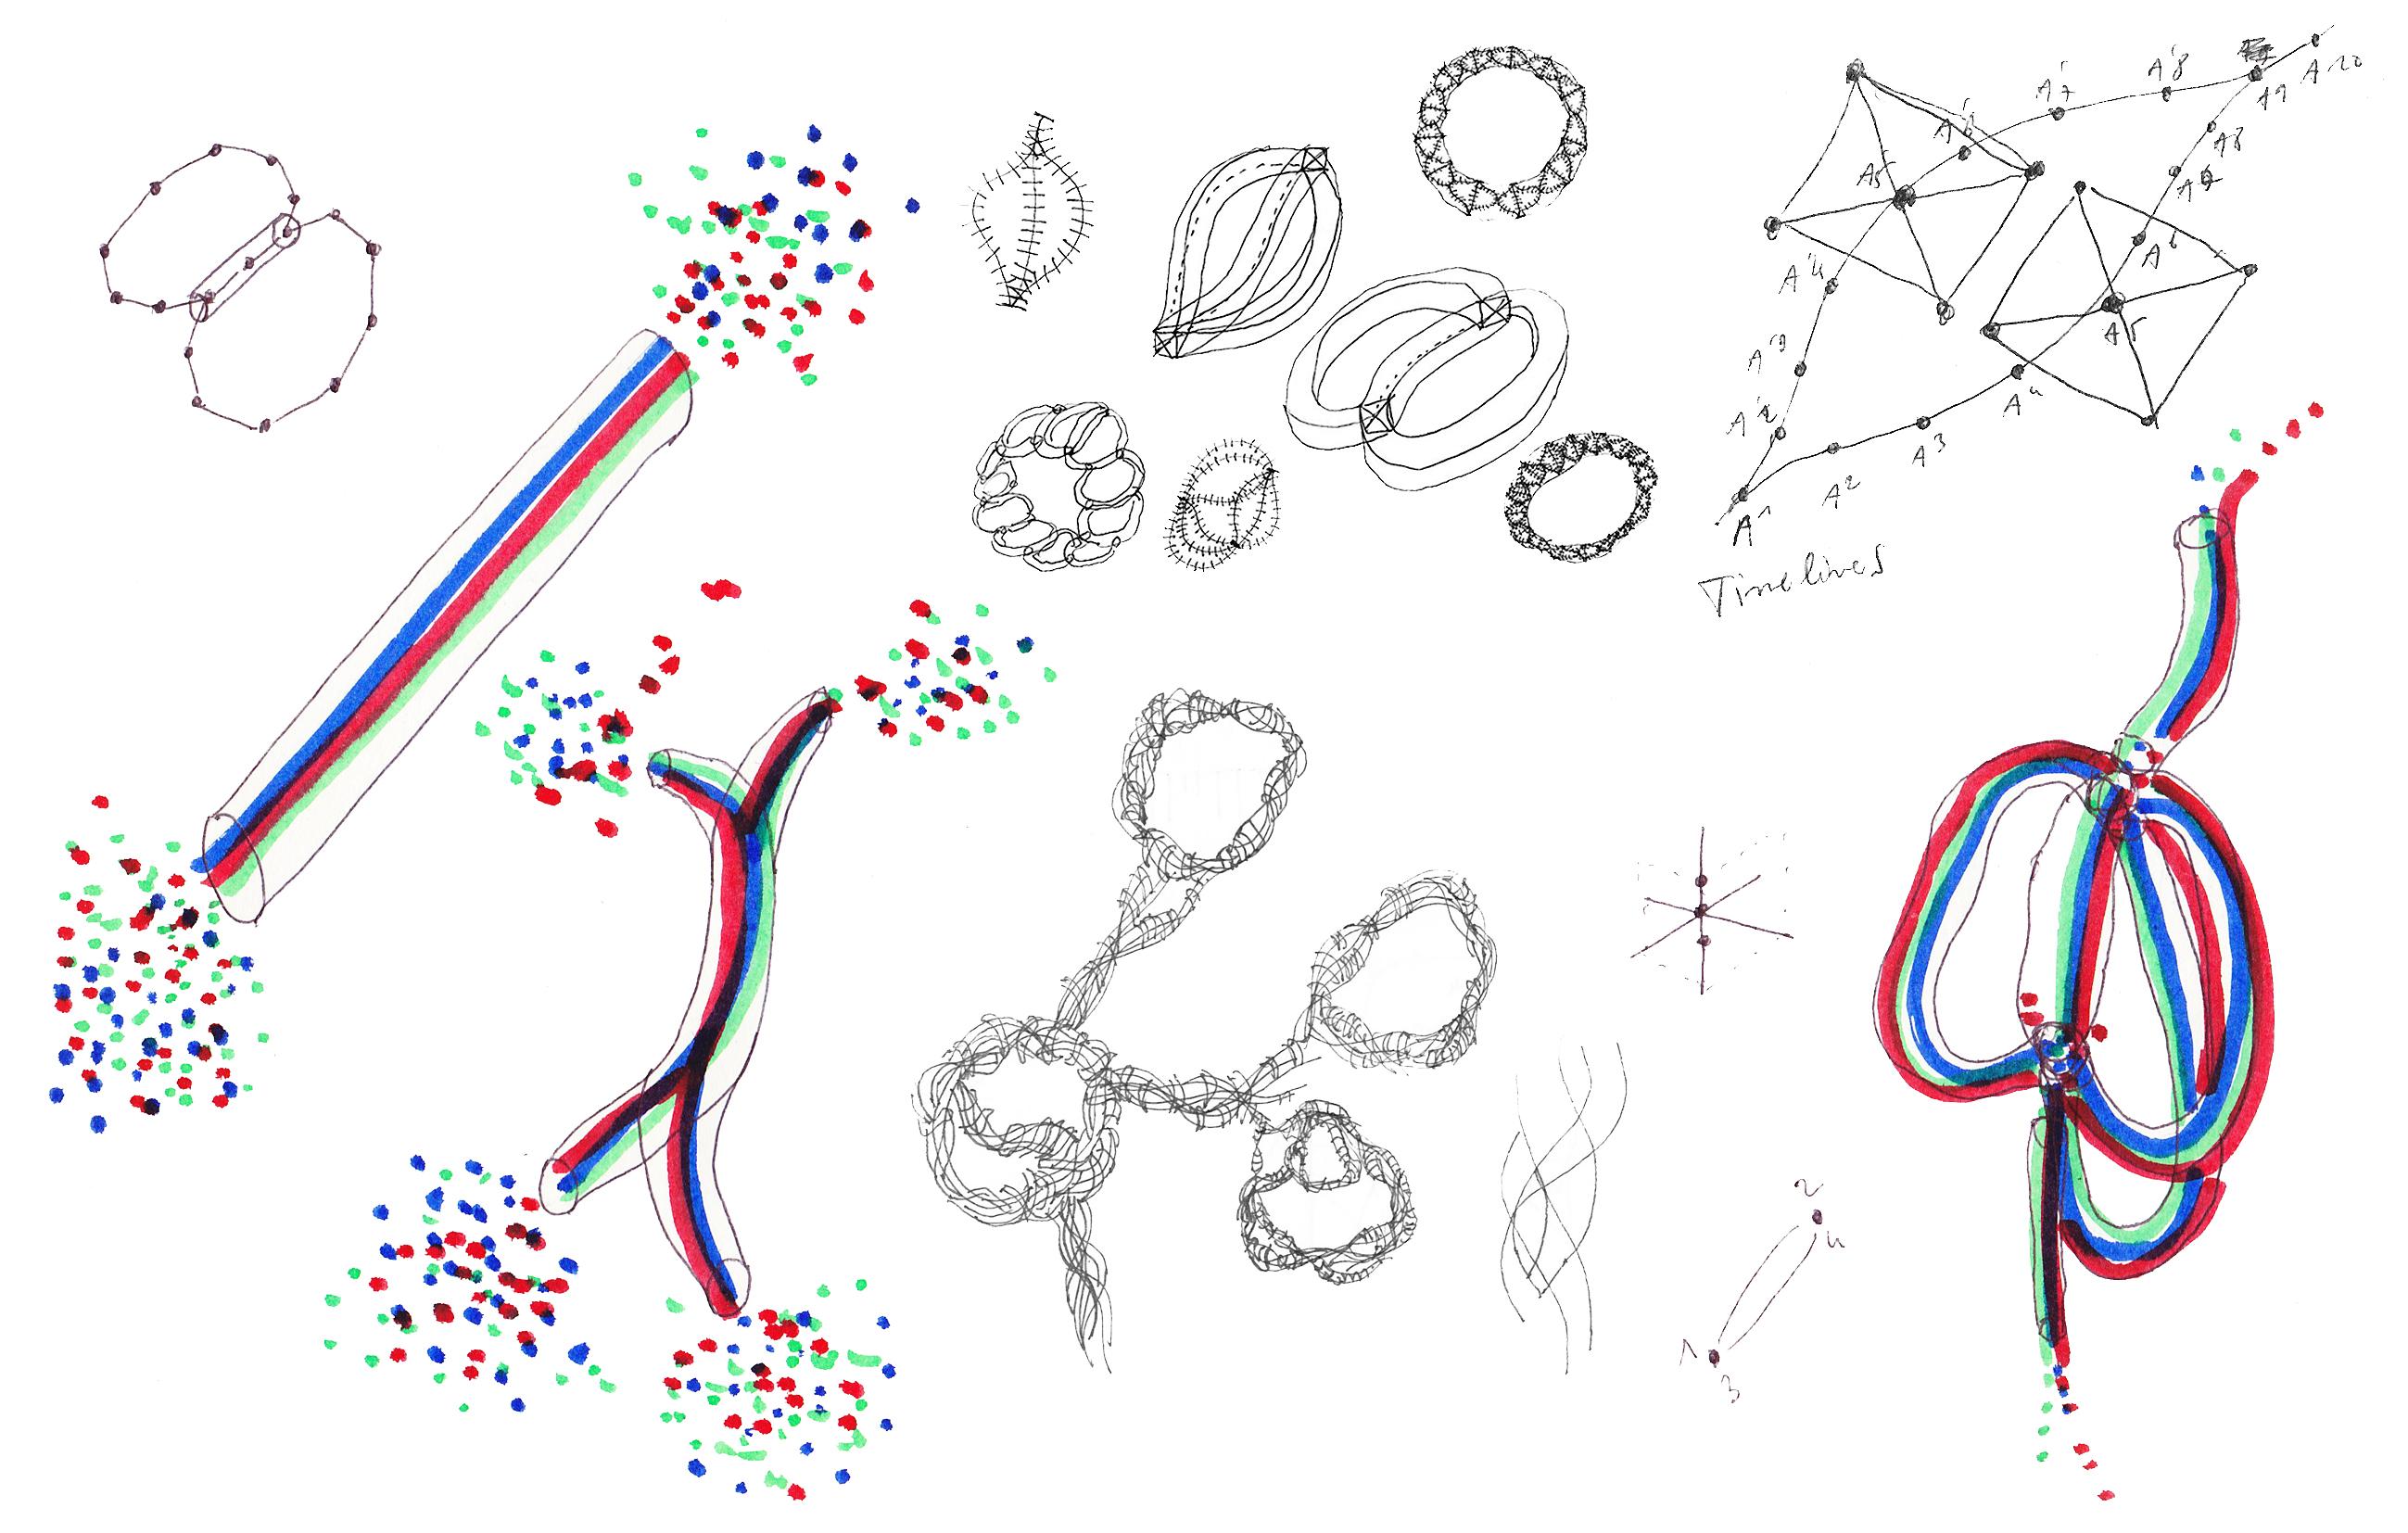 montage-illustration-mg-6